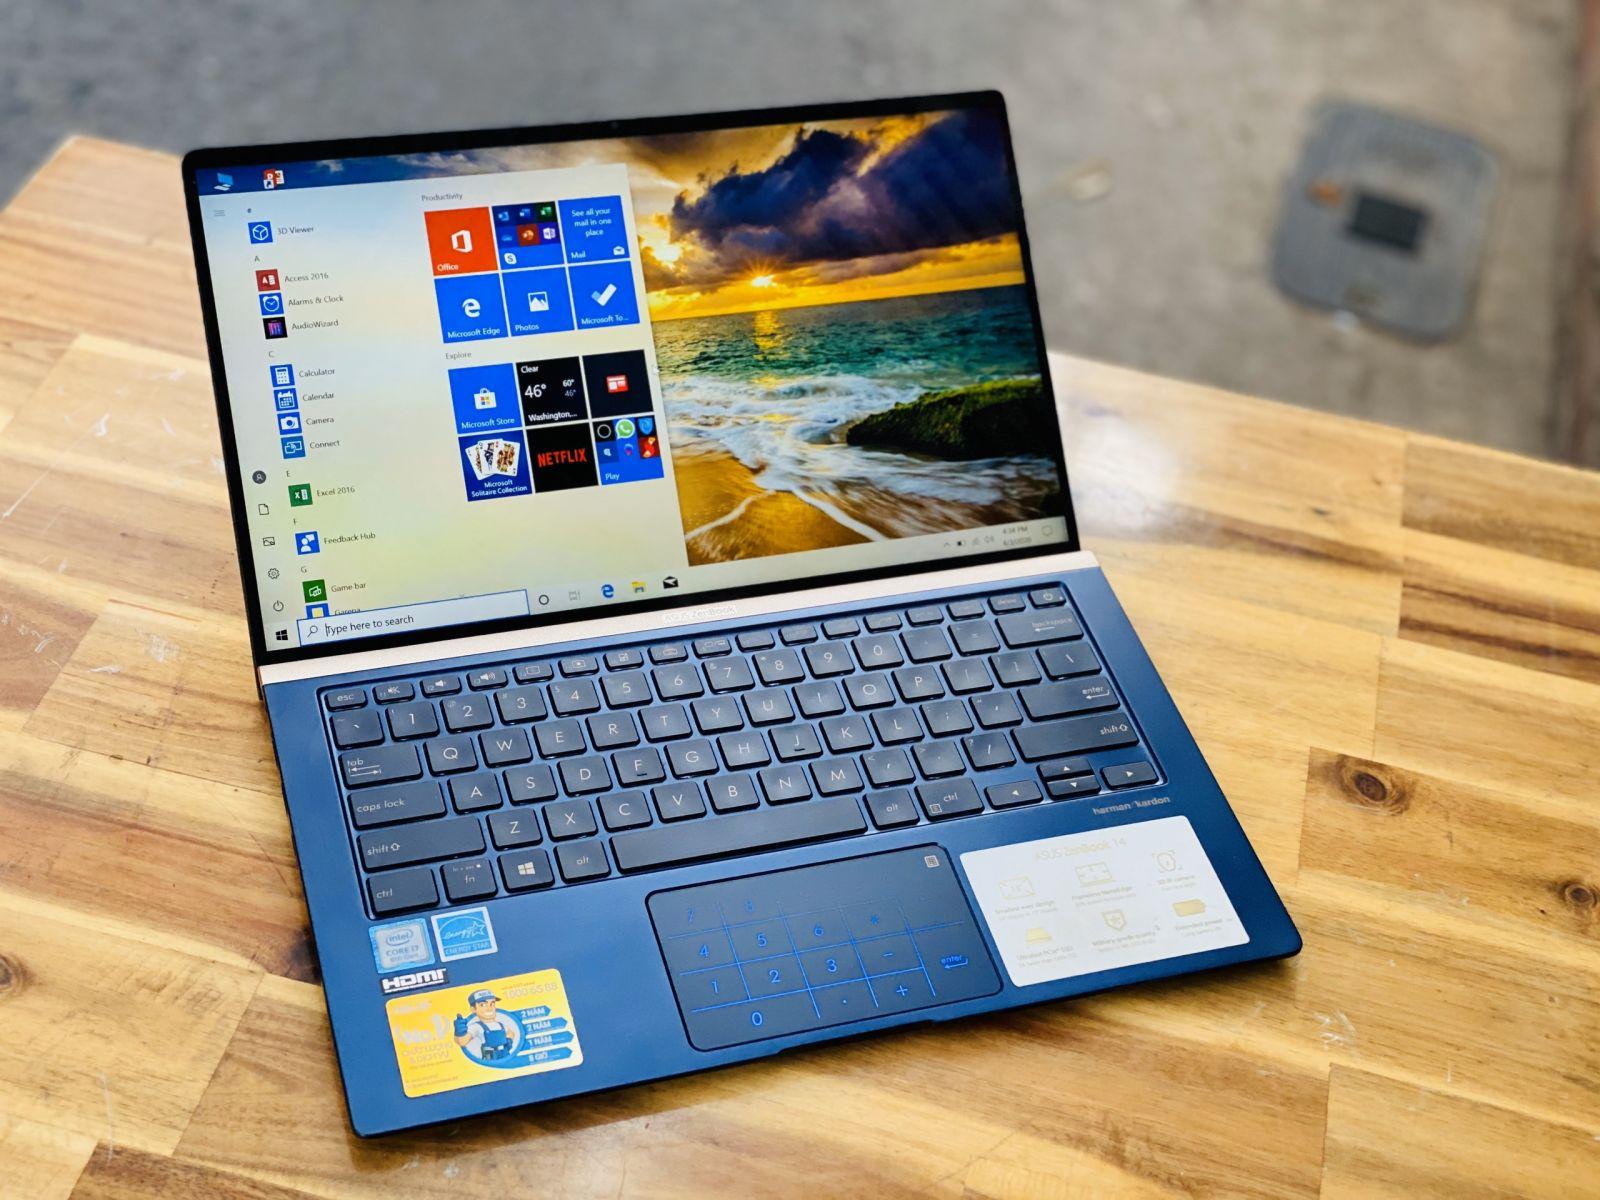 Laptop Asus Zenbook UX433FA, I7 8565U 8CPUS 8G SSD512 Full HD FaceID L